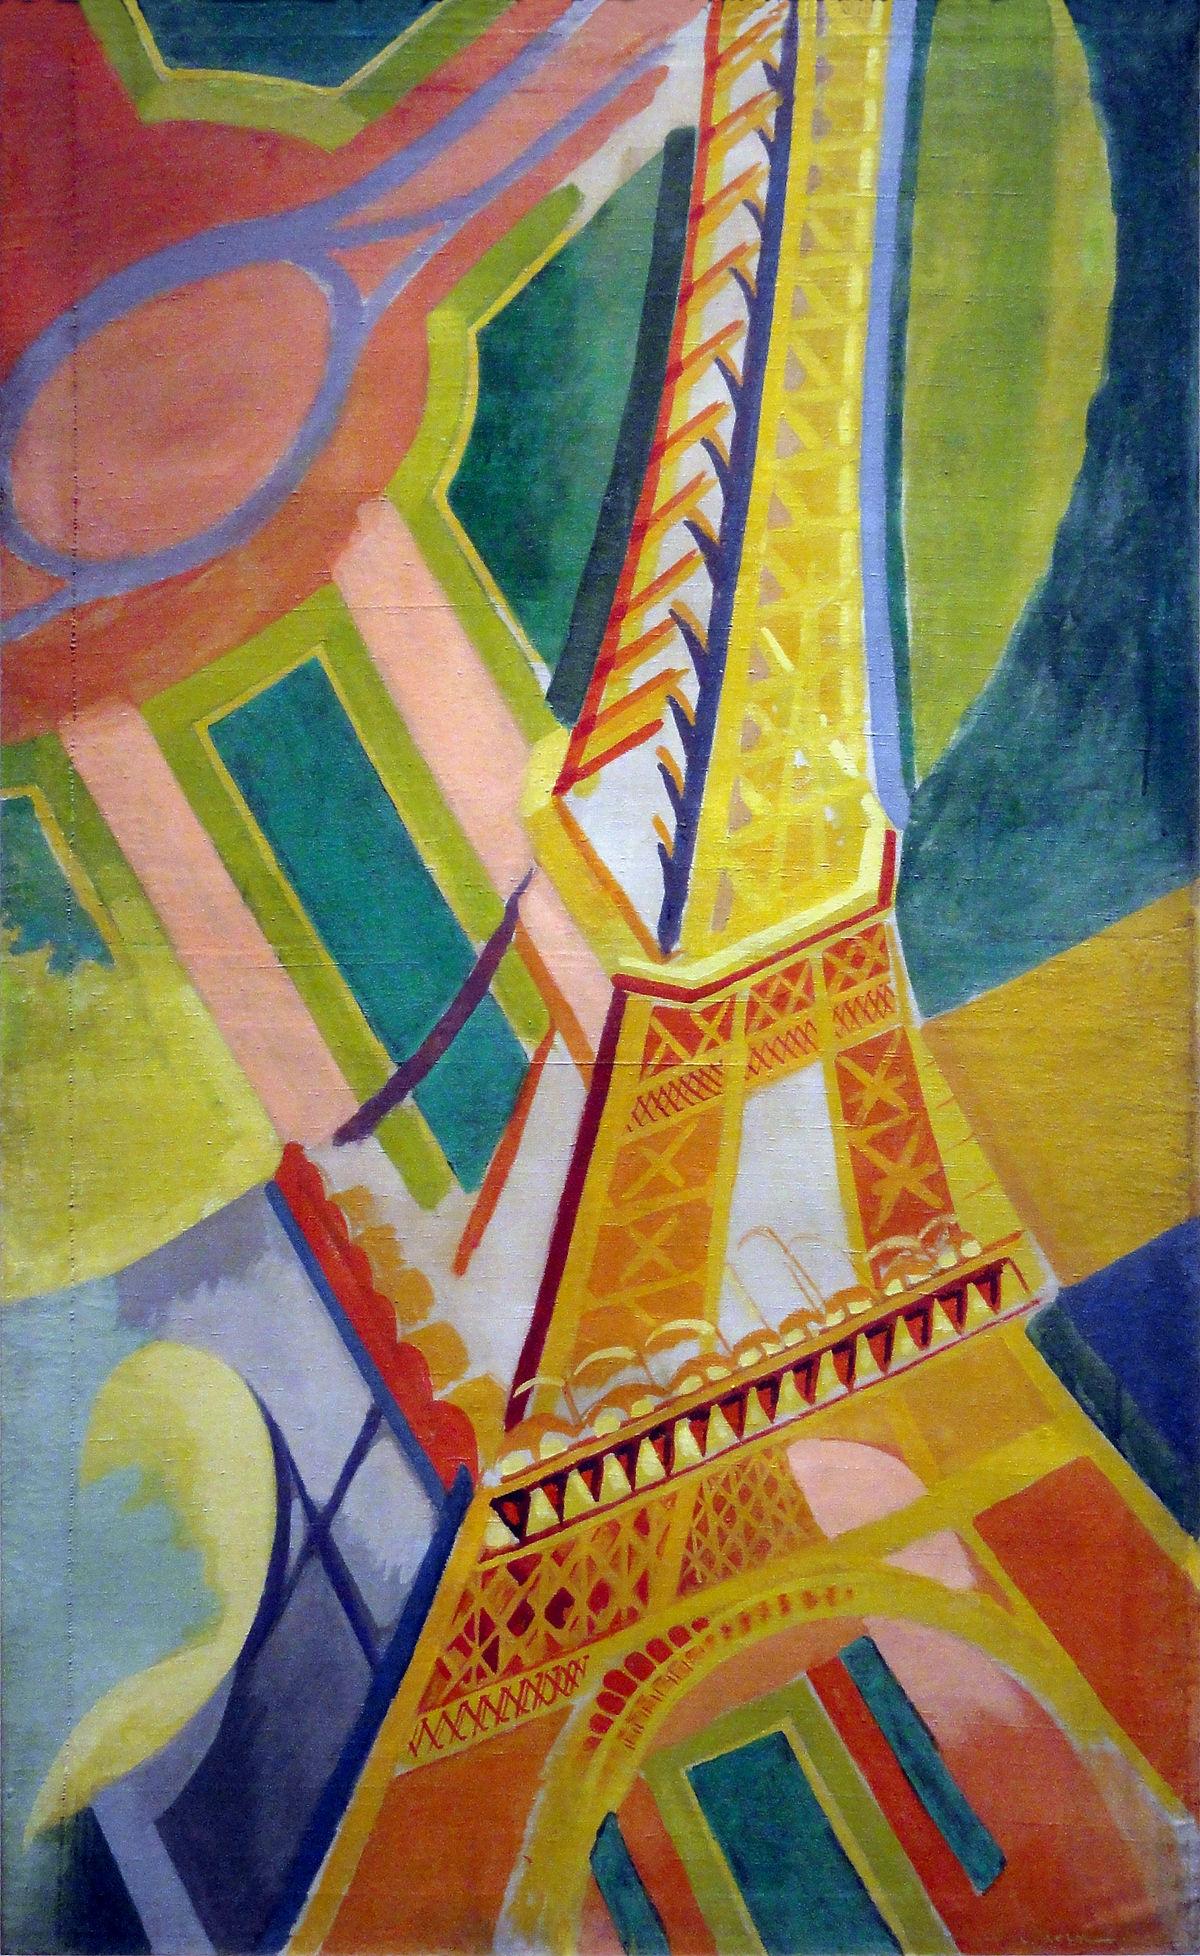 Killing Floor 2 Eiffel Tower In Background City Blocks Subway Map.Eiffel Tower In Popular Culture Wikipedia